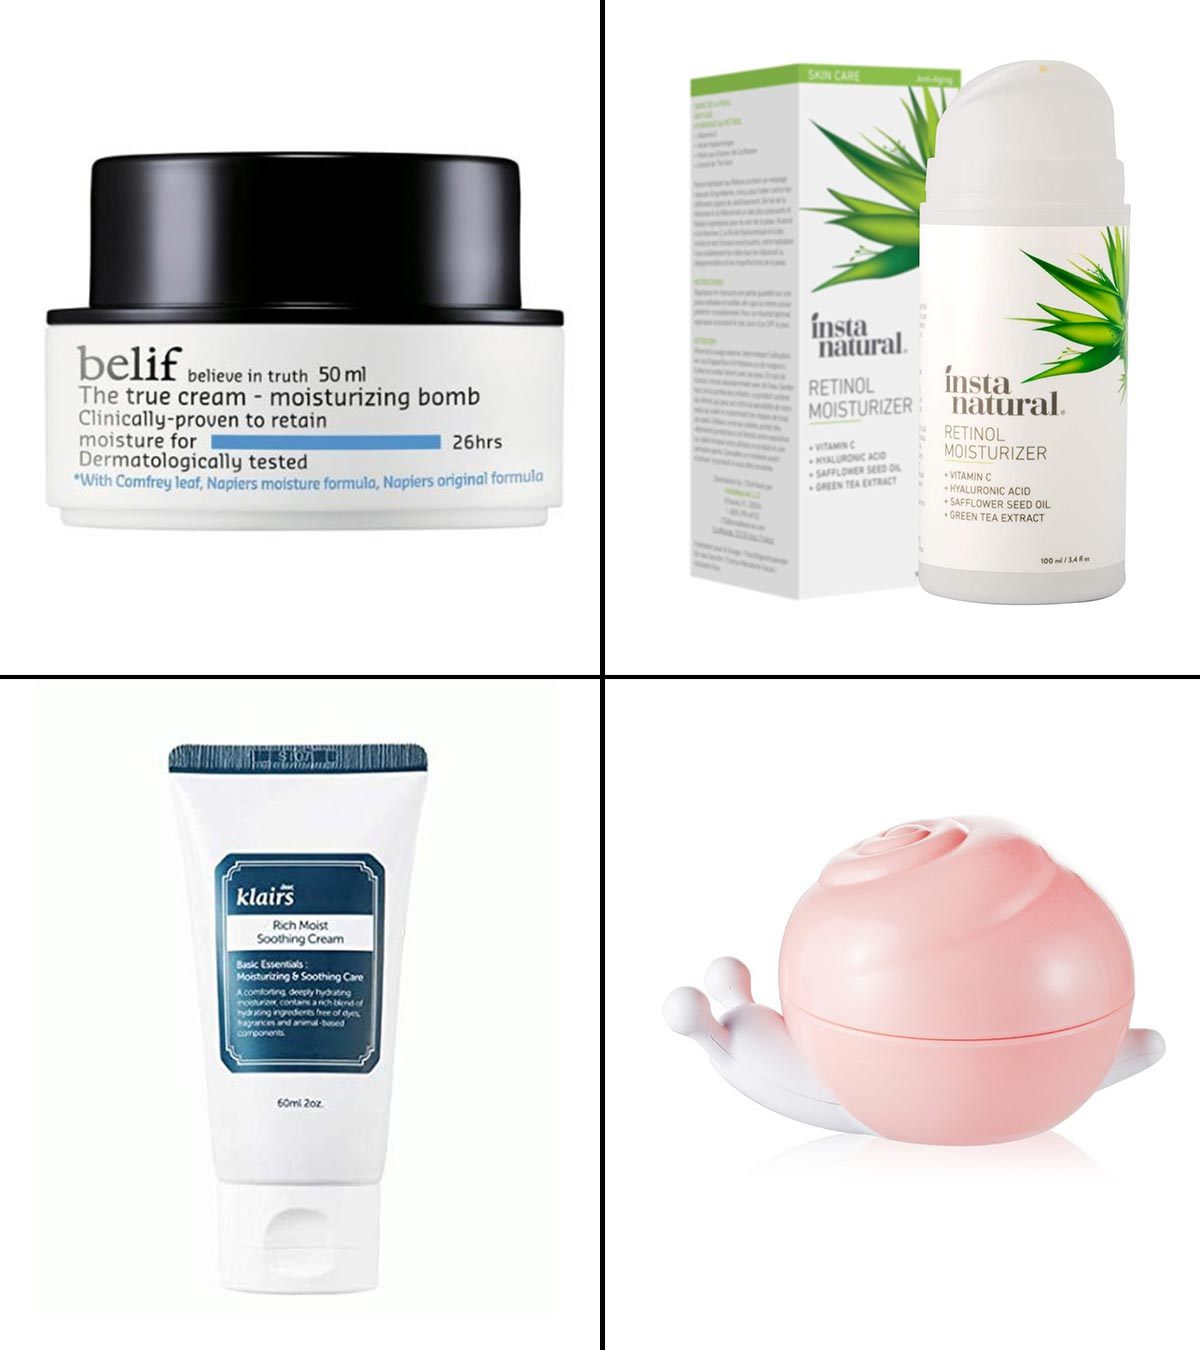 15 Best Korean Face Creams To Buy In 2020